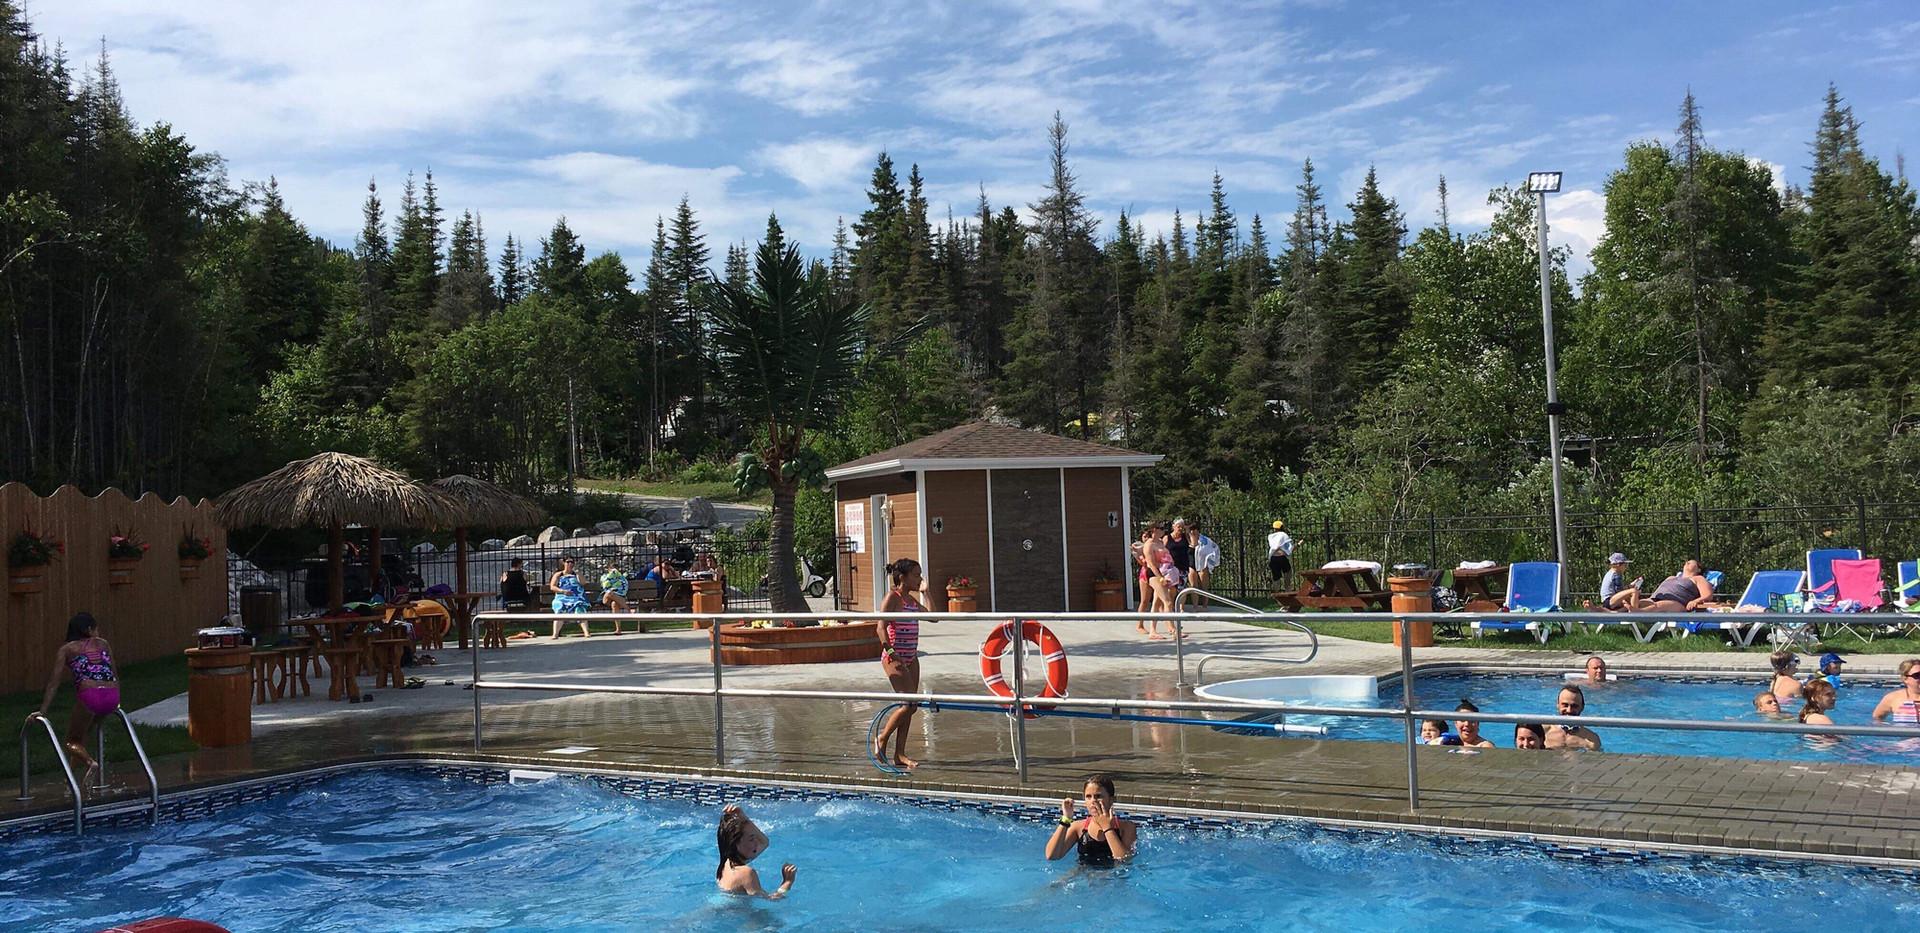 Piscine-camping-boreal